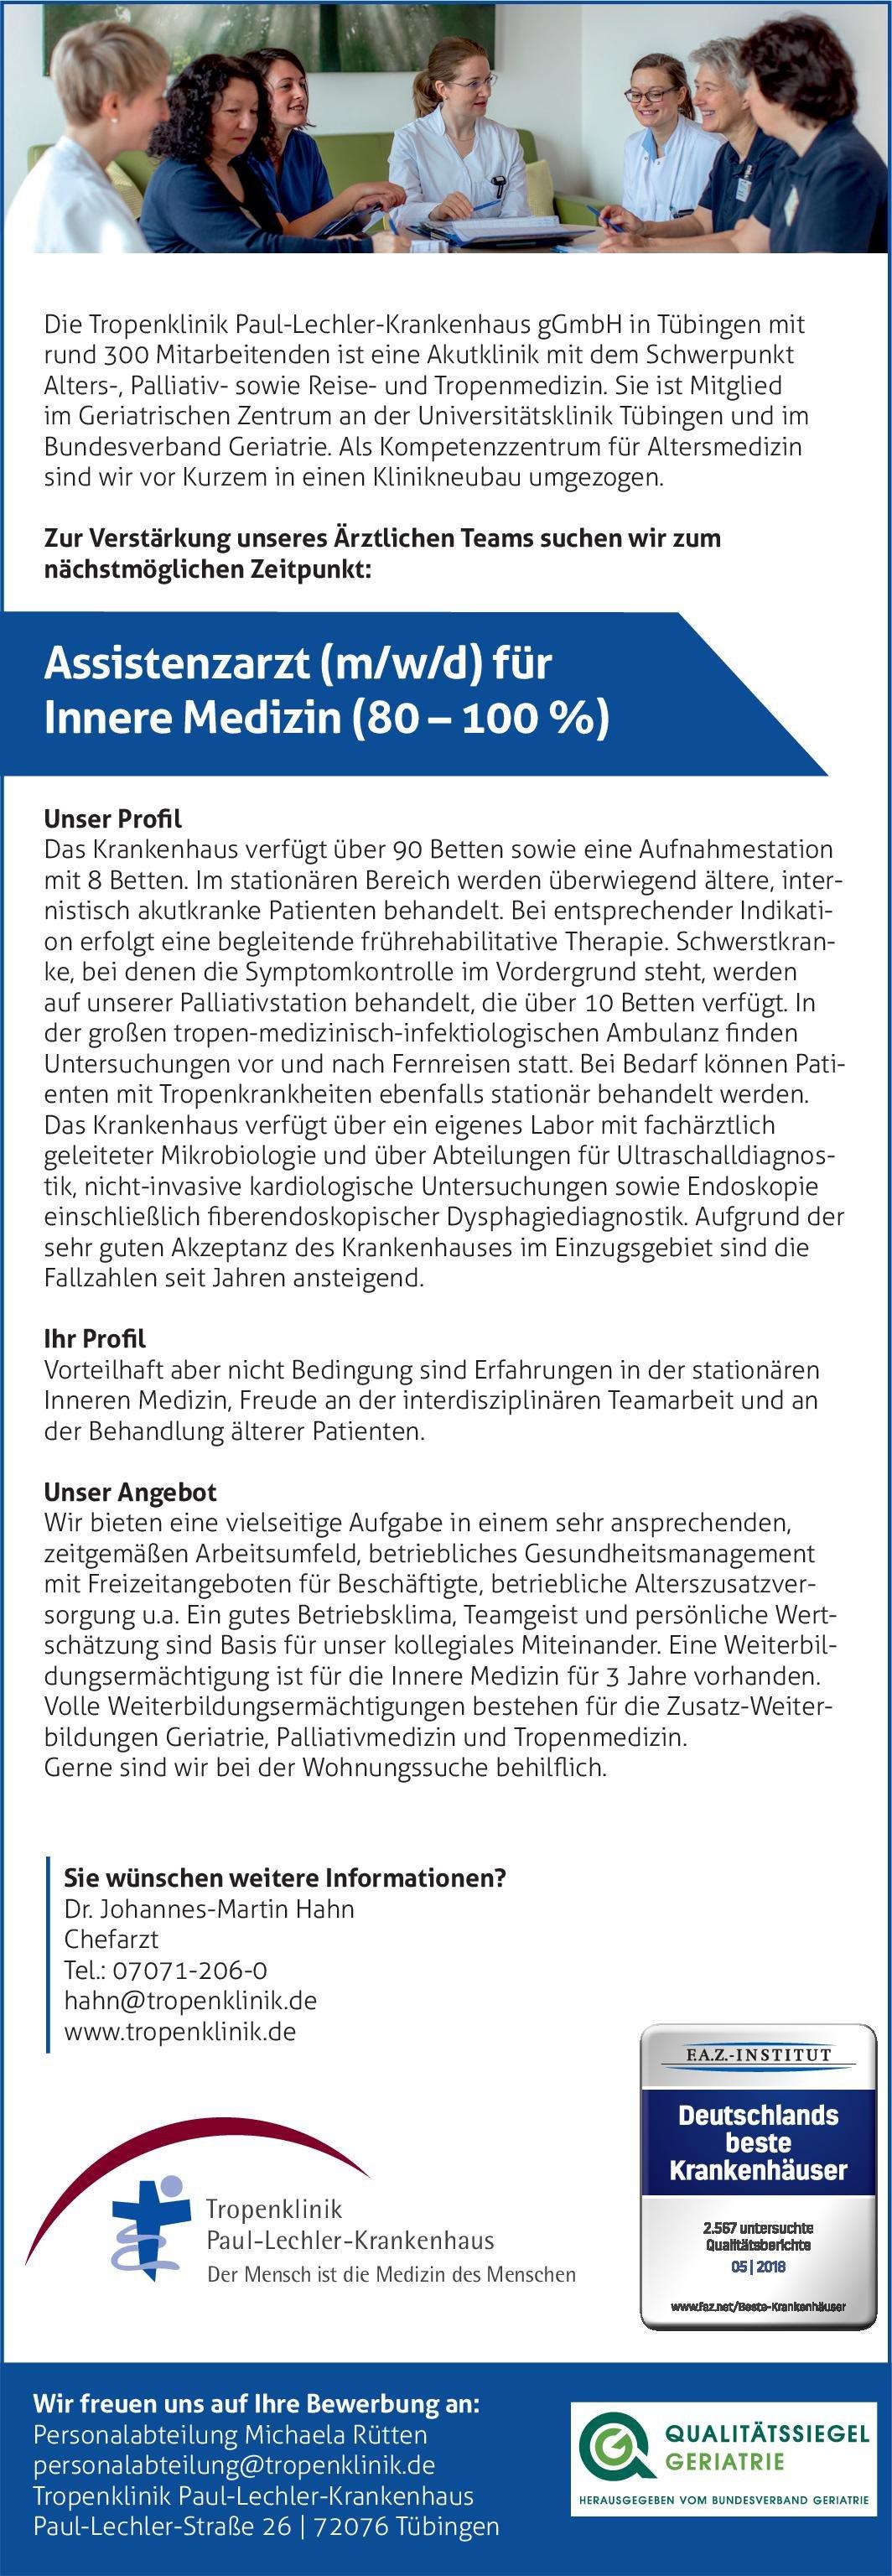 Tropenklinik Paul-Lechler-Krankenhaus gGmbH Assistenzarzt (m/w/d) für Innere Medizin (80 – 100 %)  Innere Medizin, Innere Medizin Assistenzarzt / Arzt in Weiterbildung